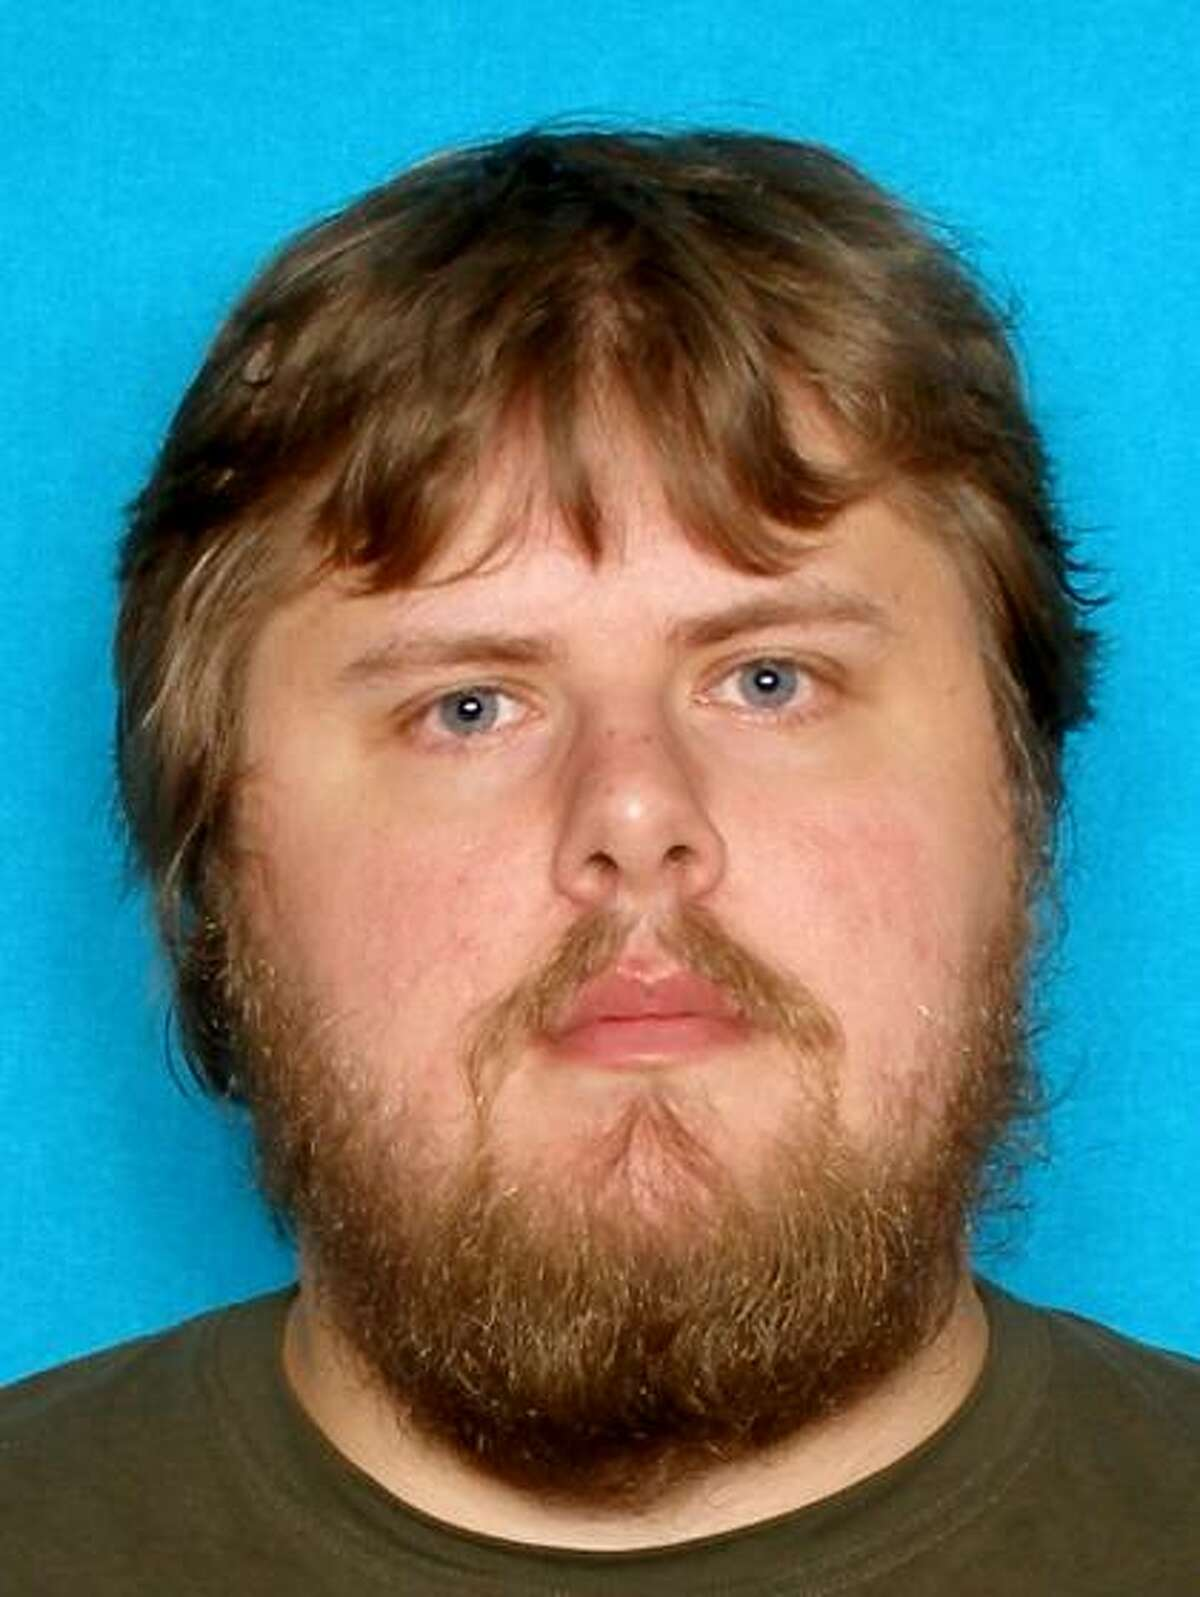 Jared Chandler King, 29, fatally shot himself at a far West Side shooting range last week.